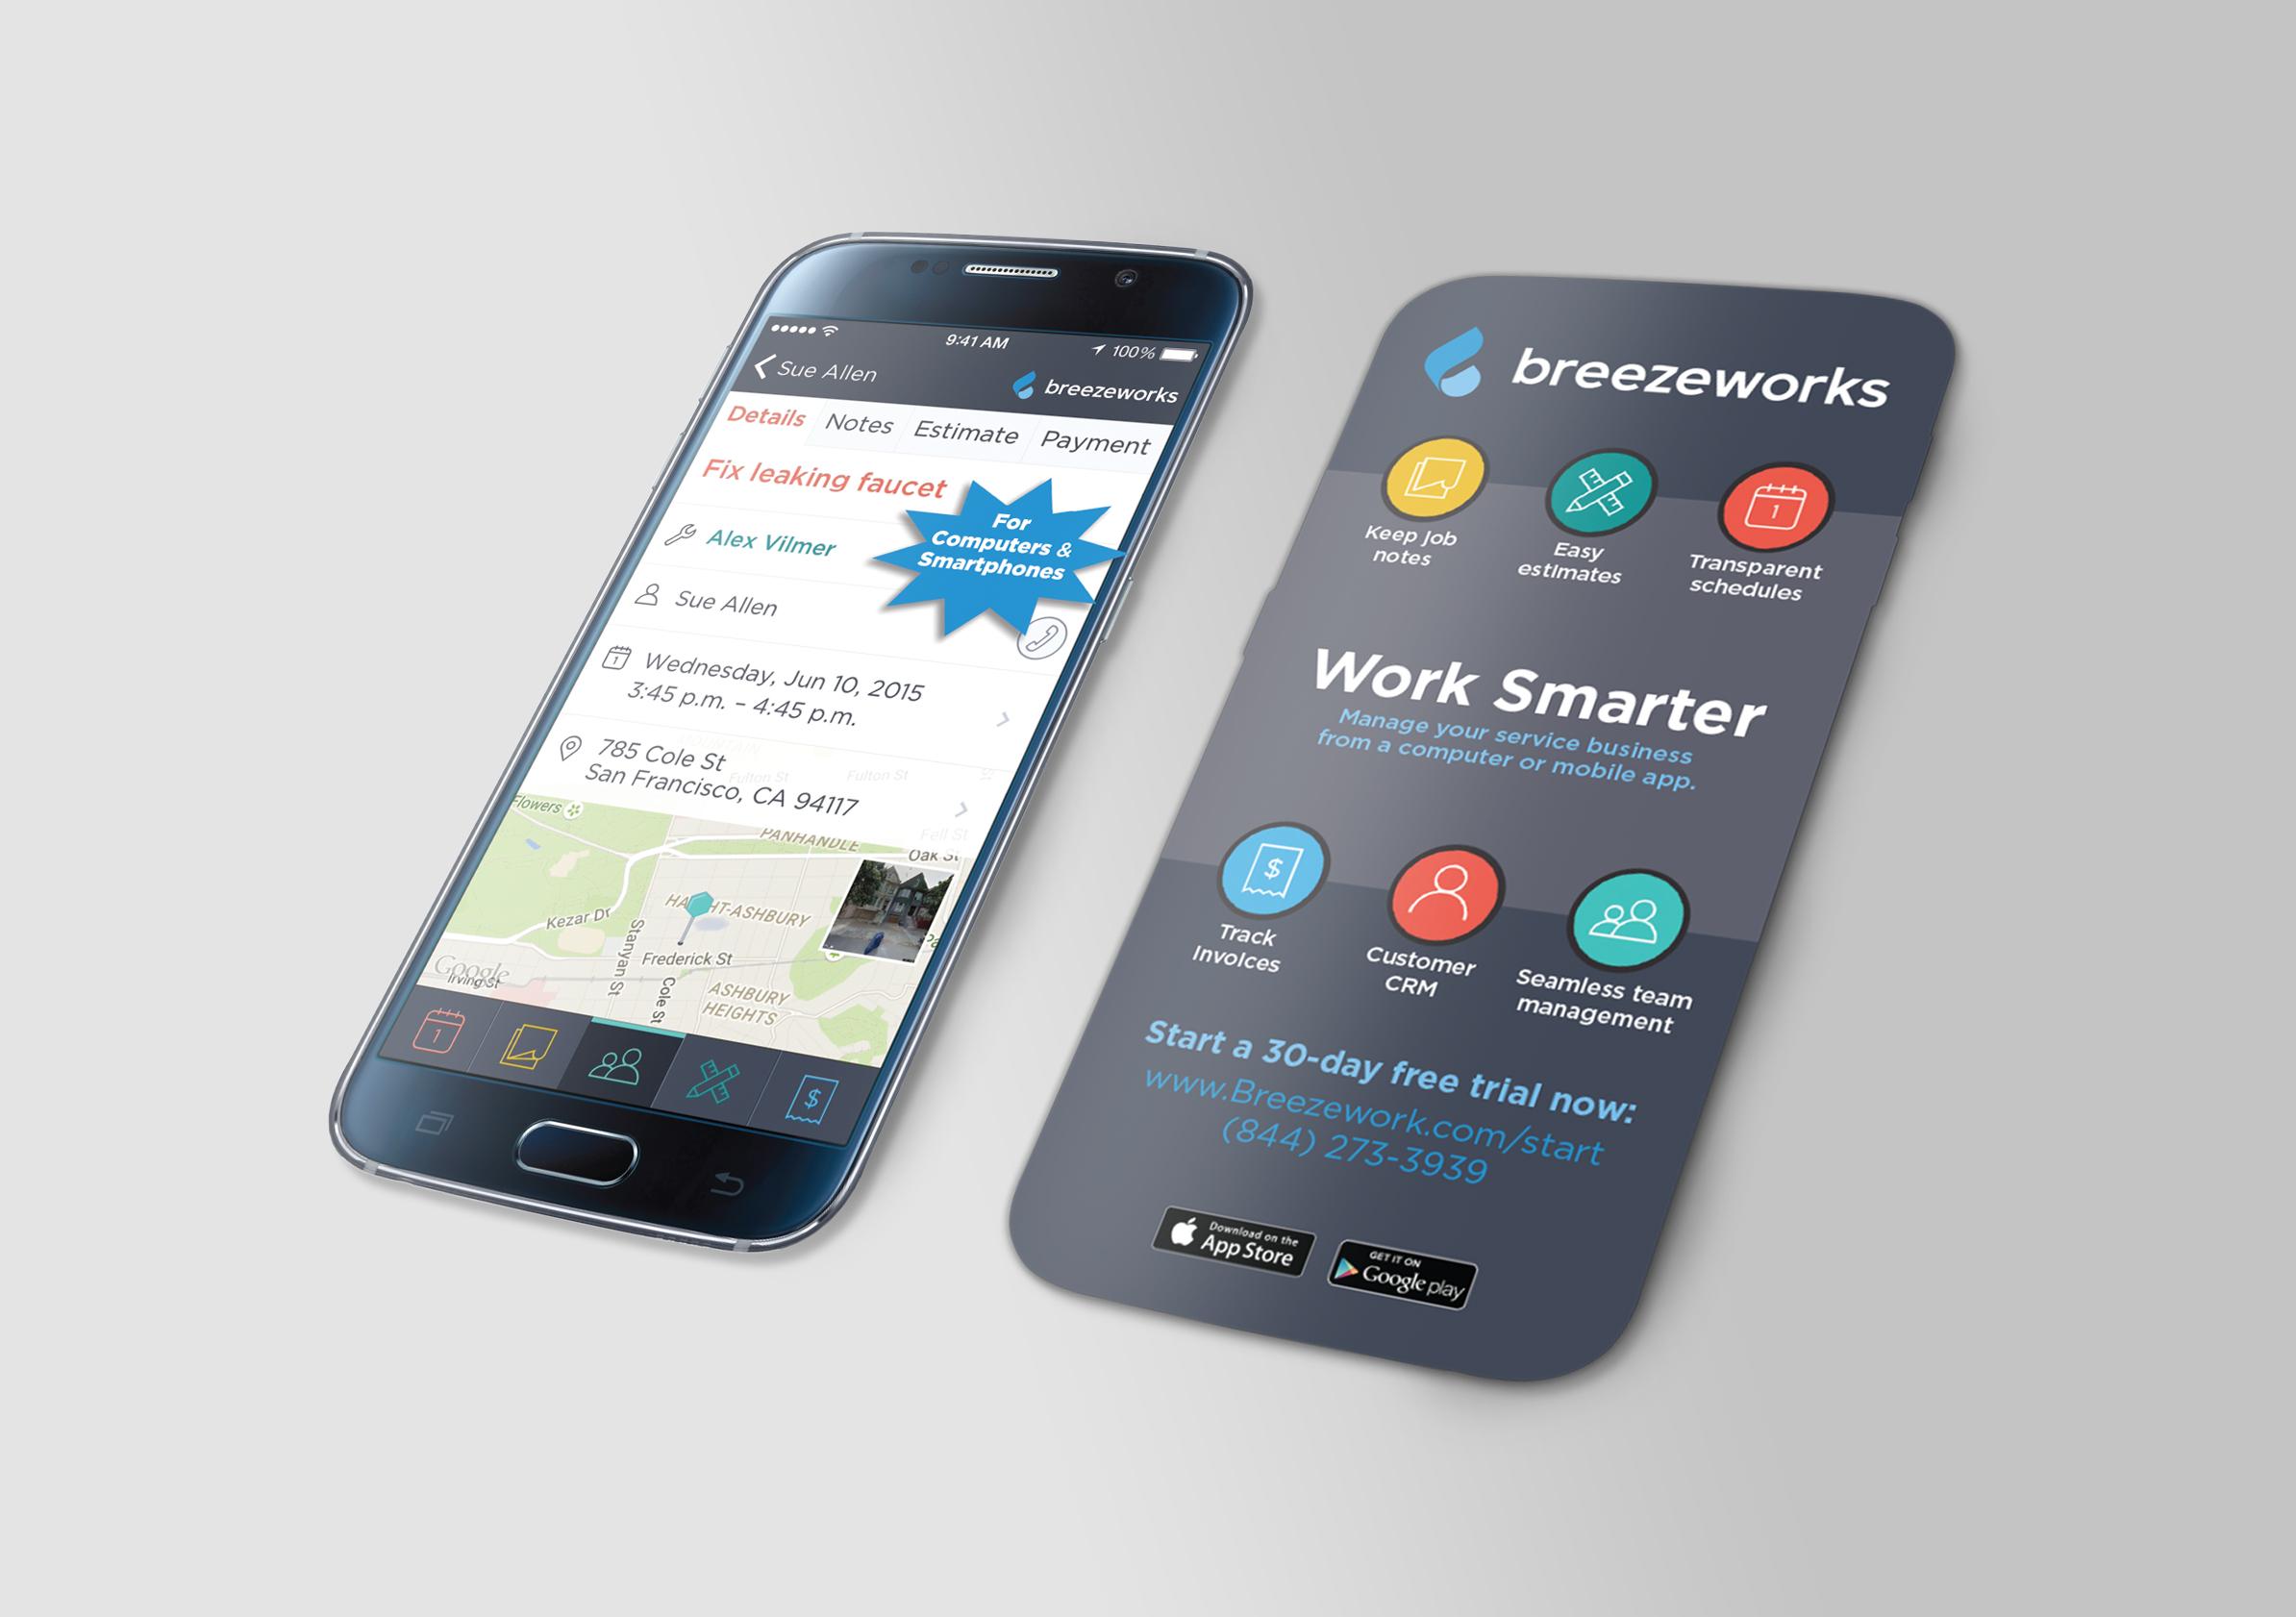 Breezeworks Galaxy S6 Promo Card